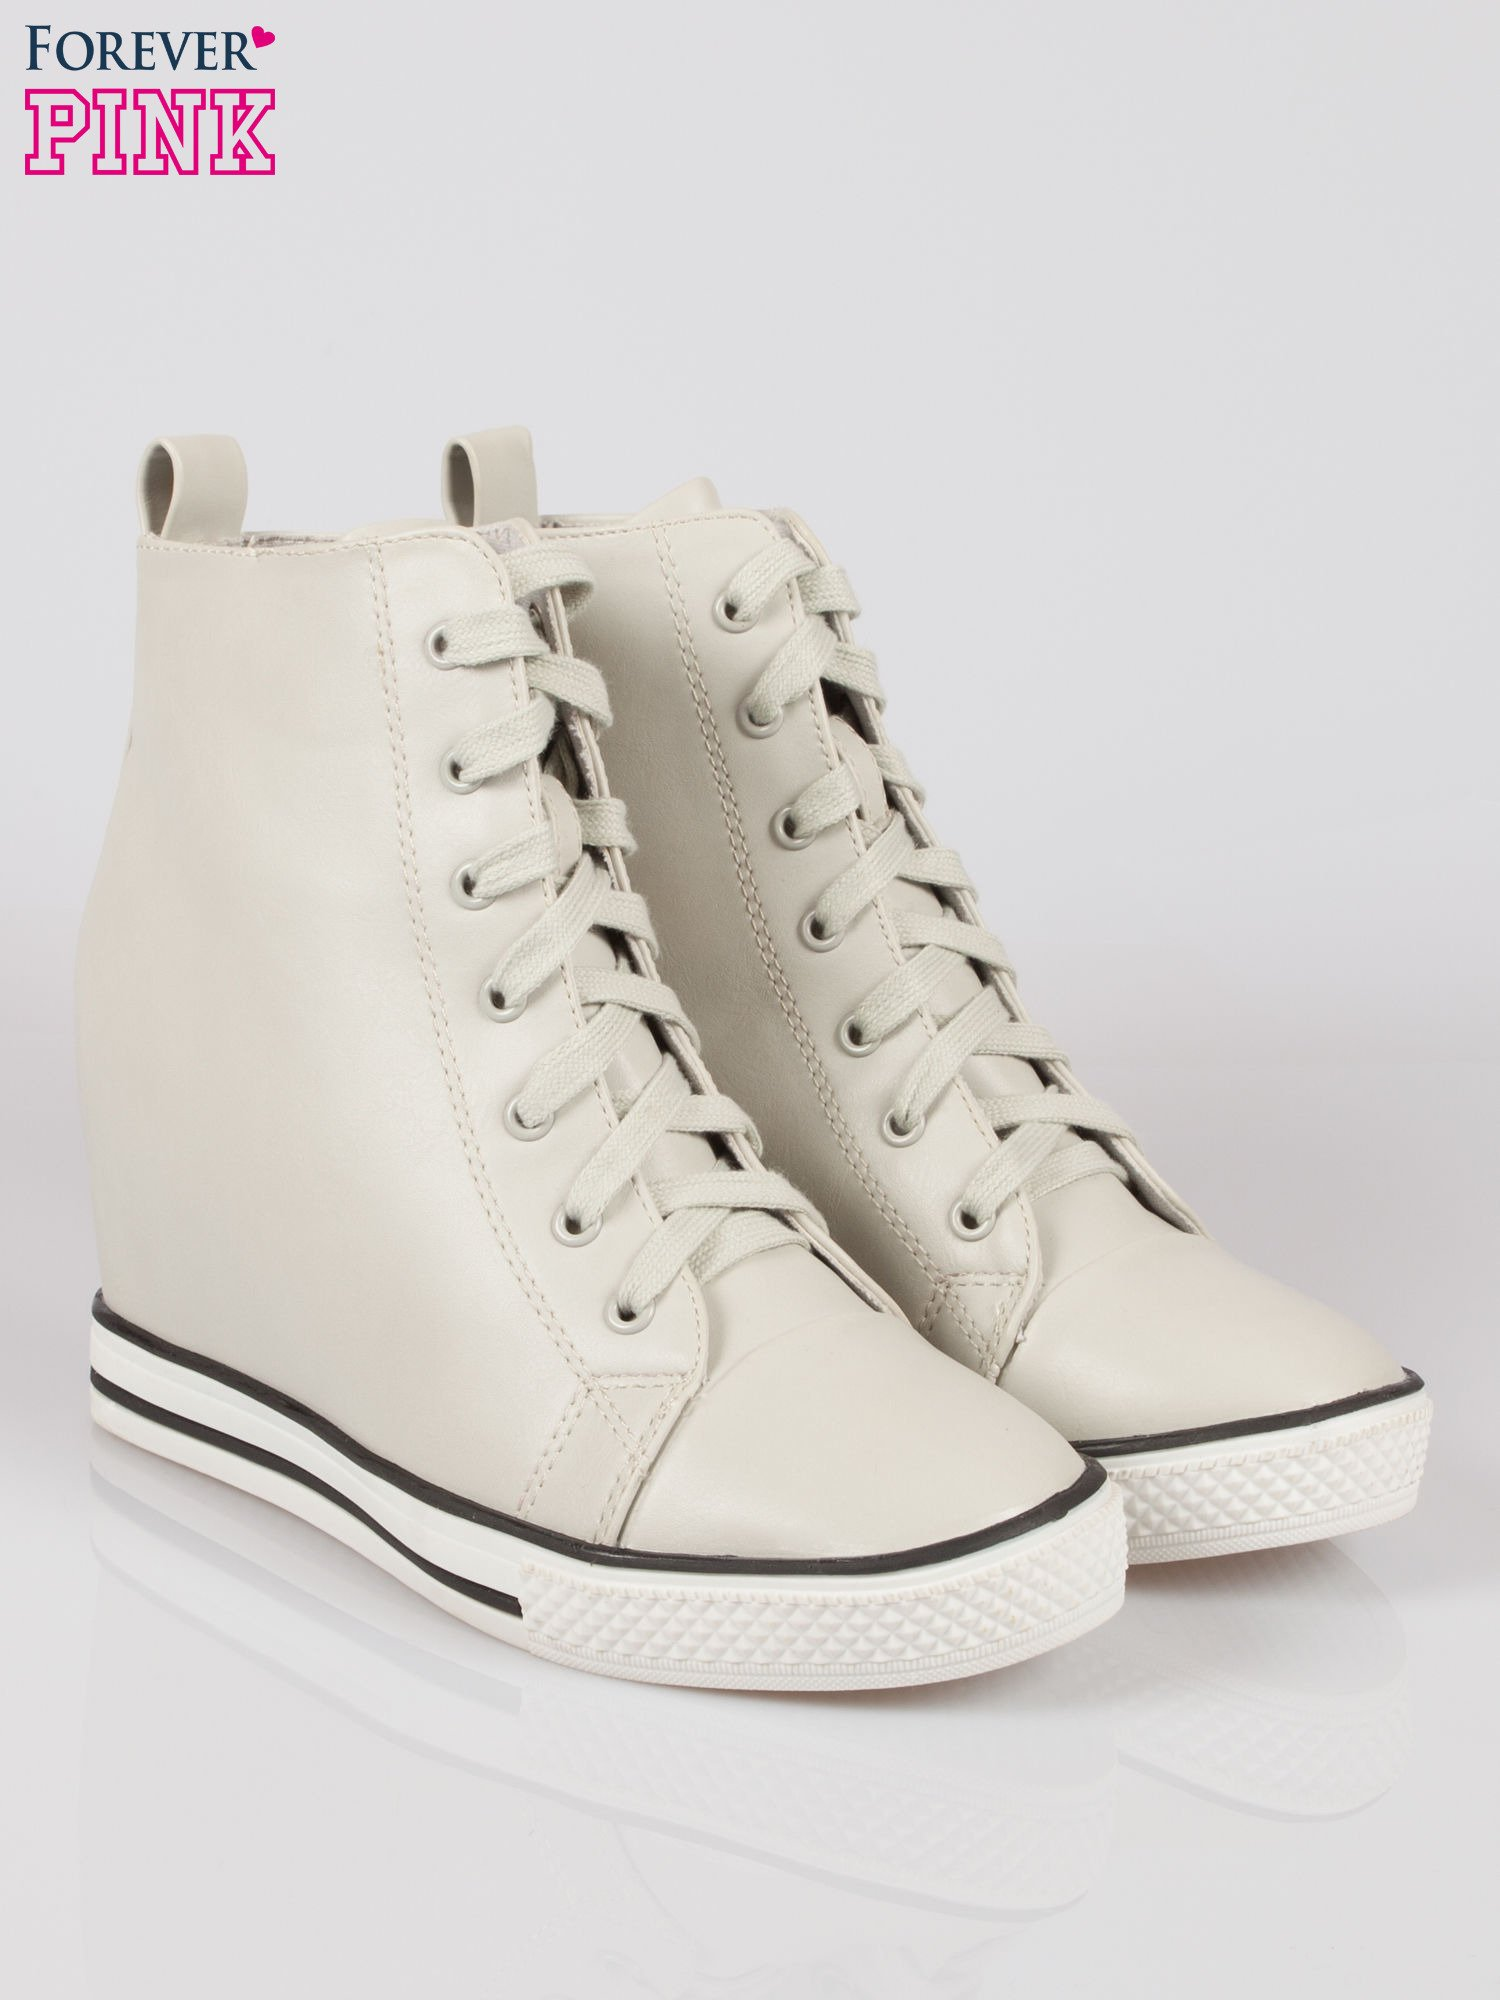 Szare skórzane sneakersy damskie                                  zdj.                                  2